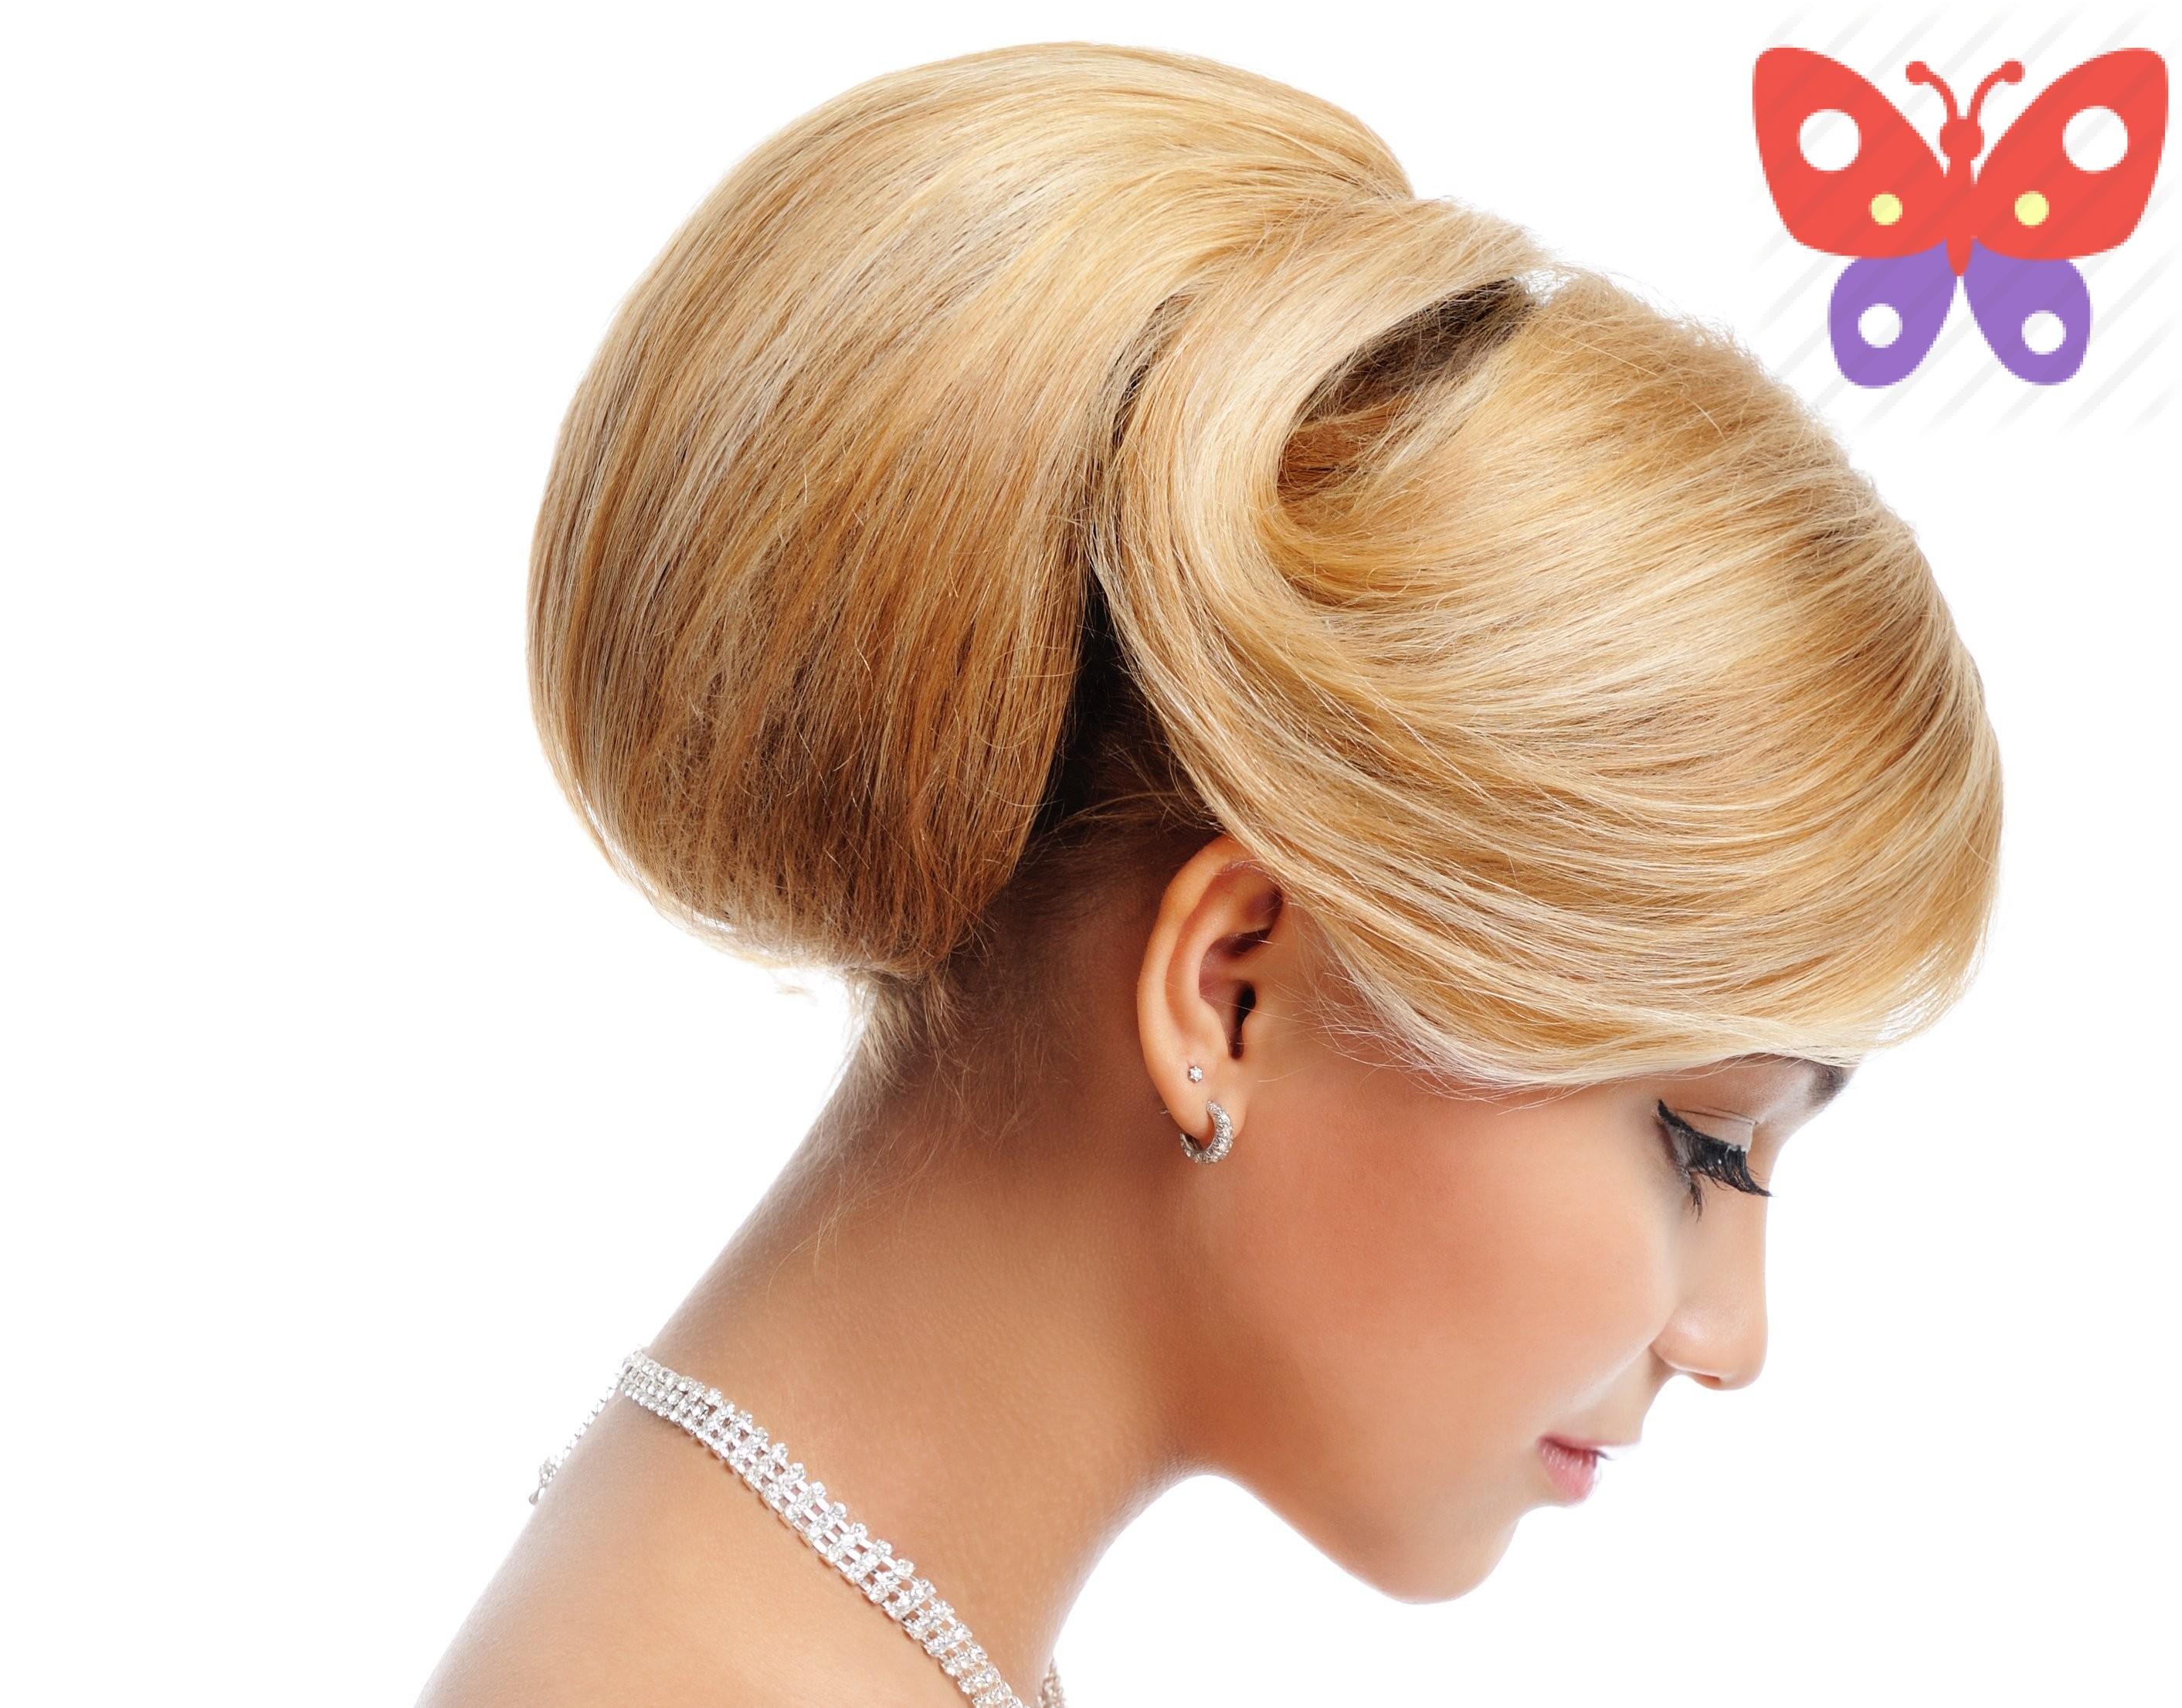 1topuz-saç-modelleri